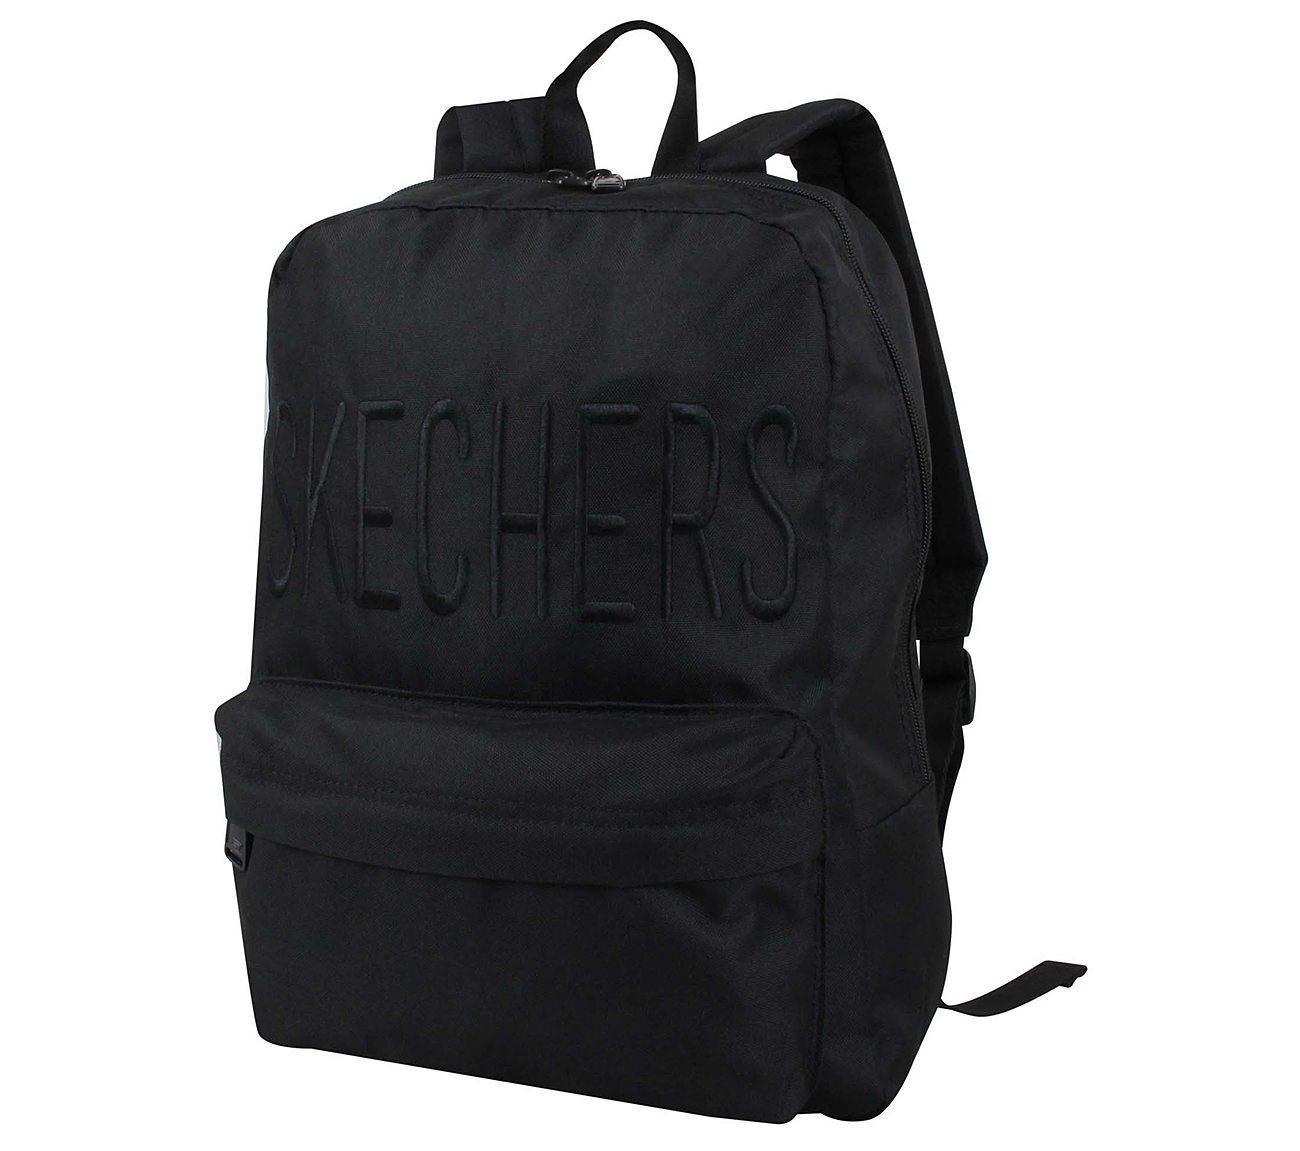 Heyday Backpack